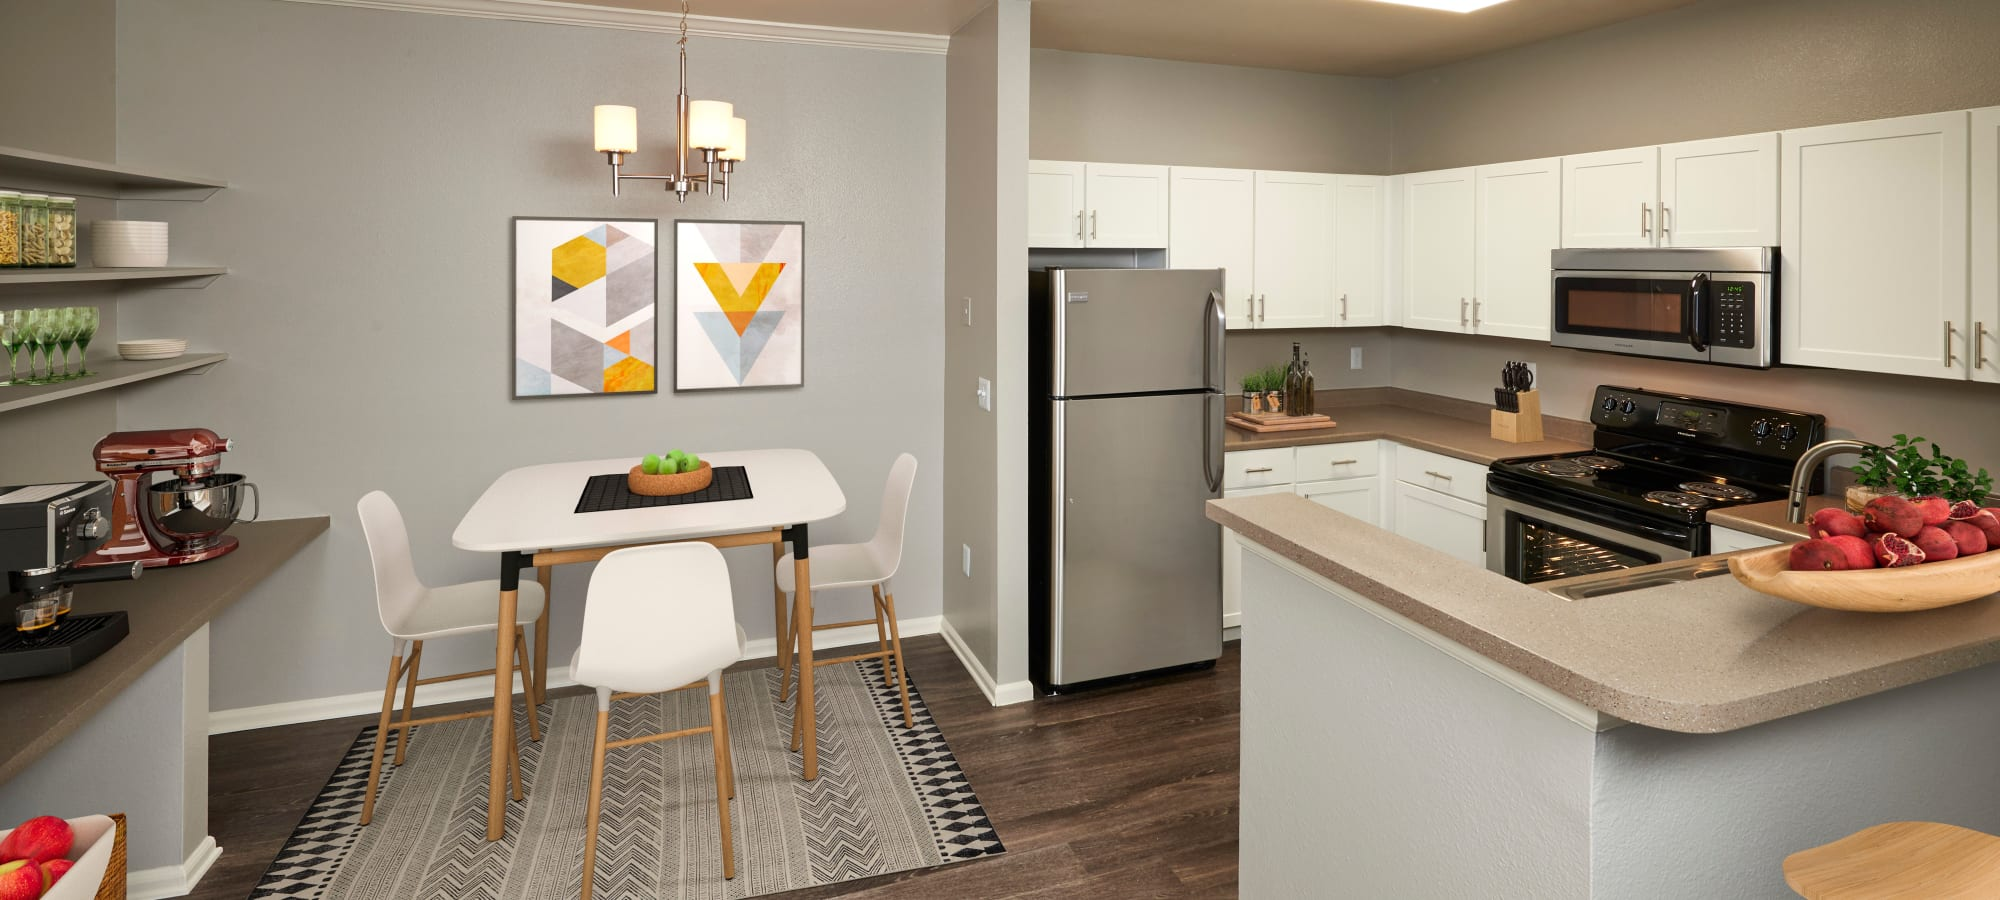 Aurora, Colorado apartments at Westridge Apartments